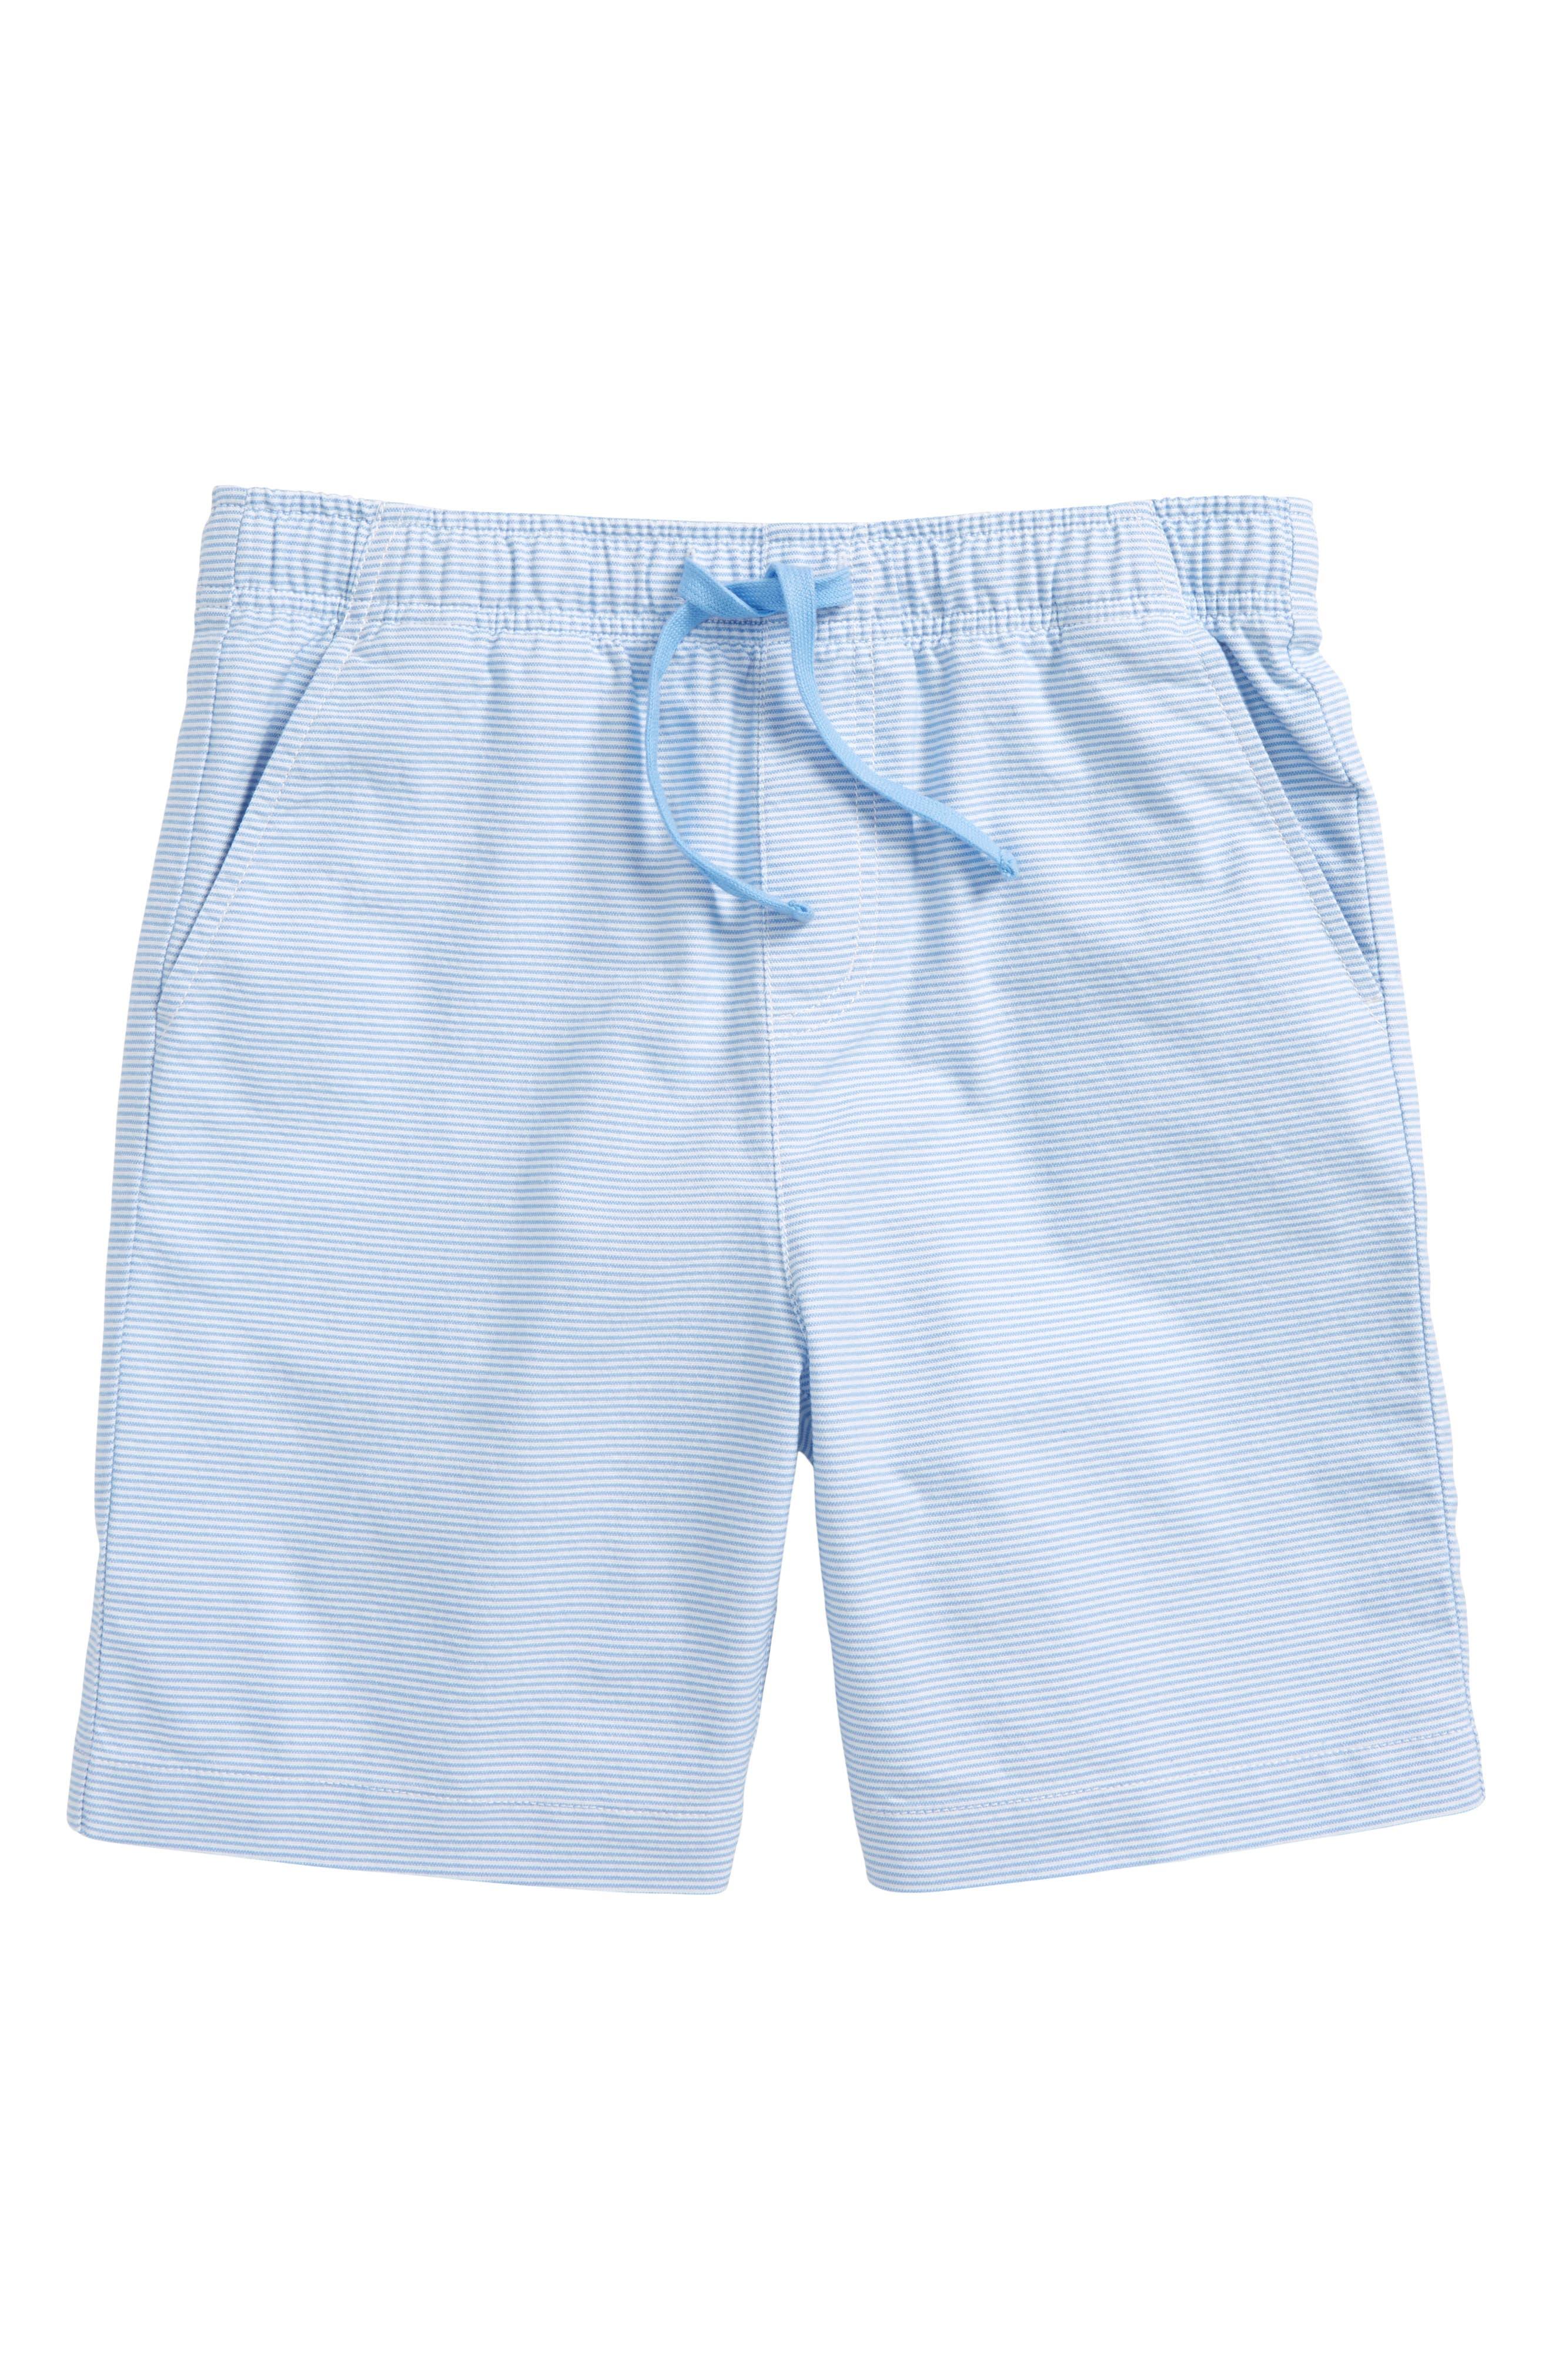 Oxford Stripe Shorts,                             Main thumbnail 1, color,                             484